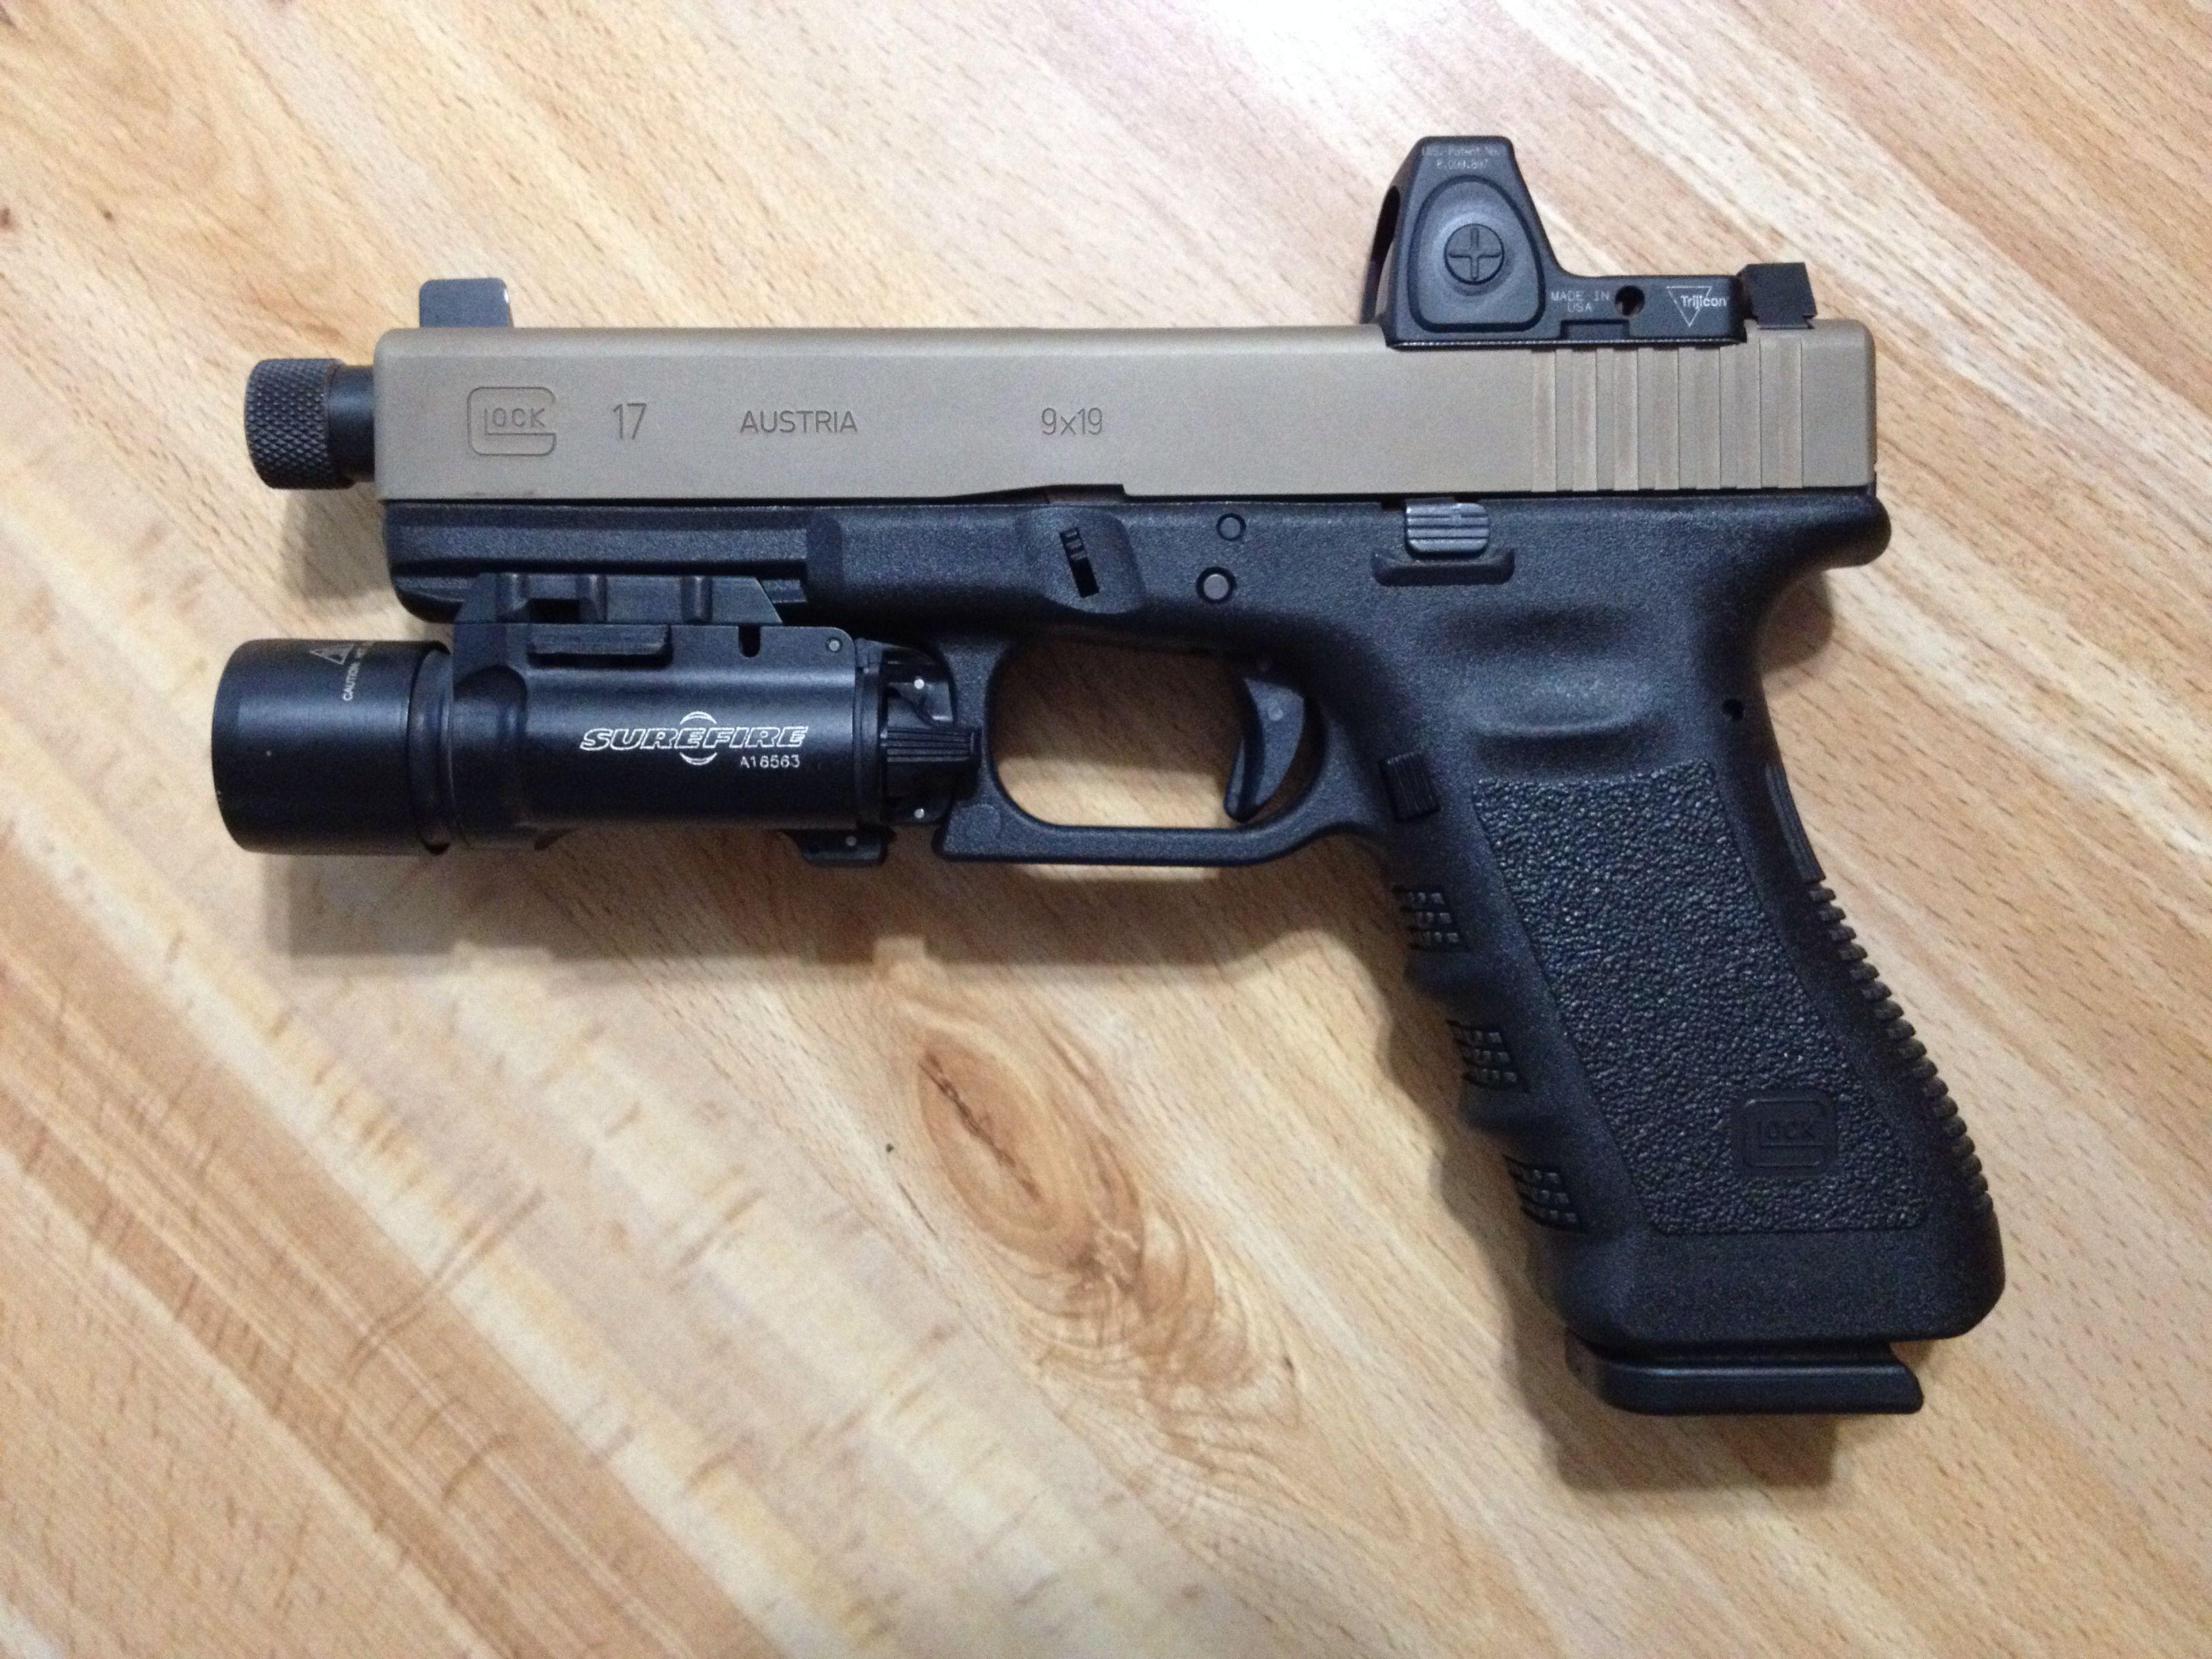 Glock 17 gen 3, Ion-bonded milled slide, Lone Wolf threaded barrel